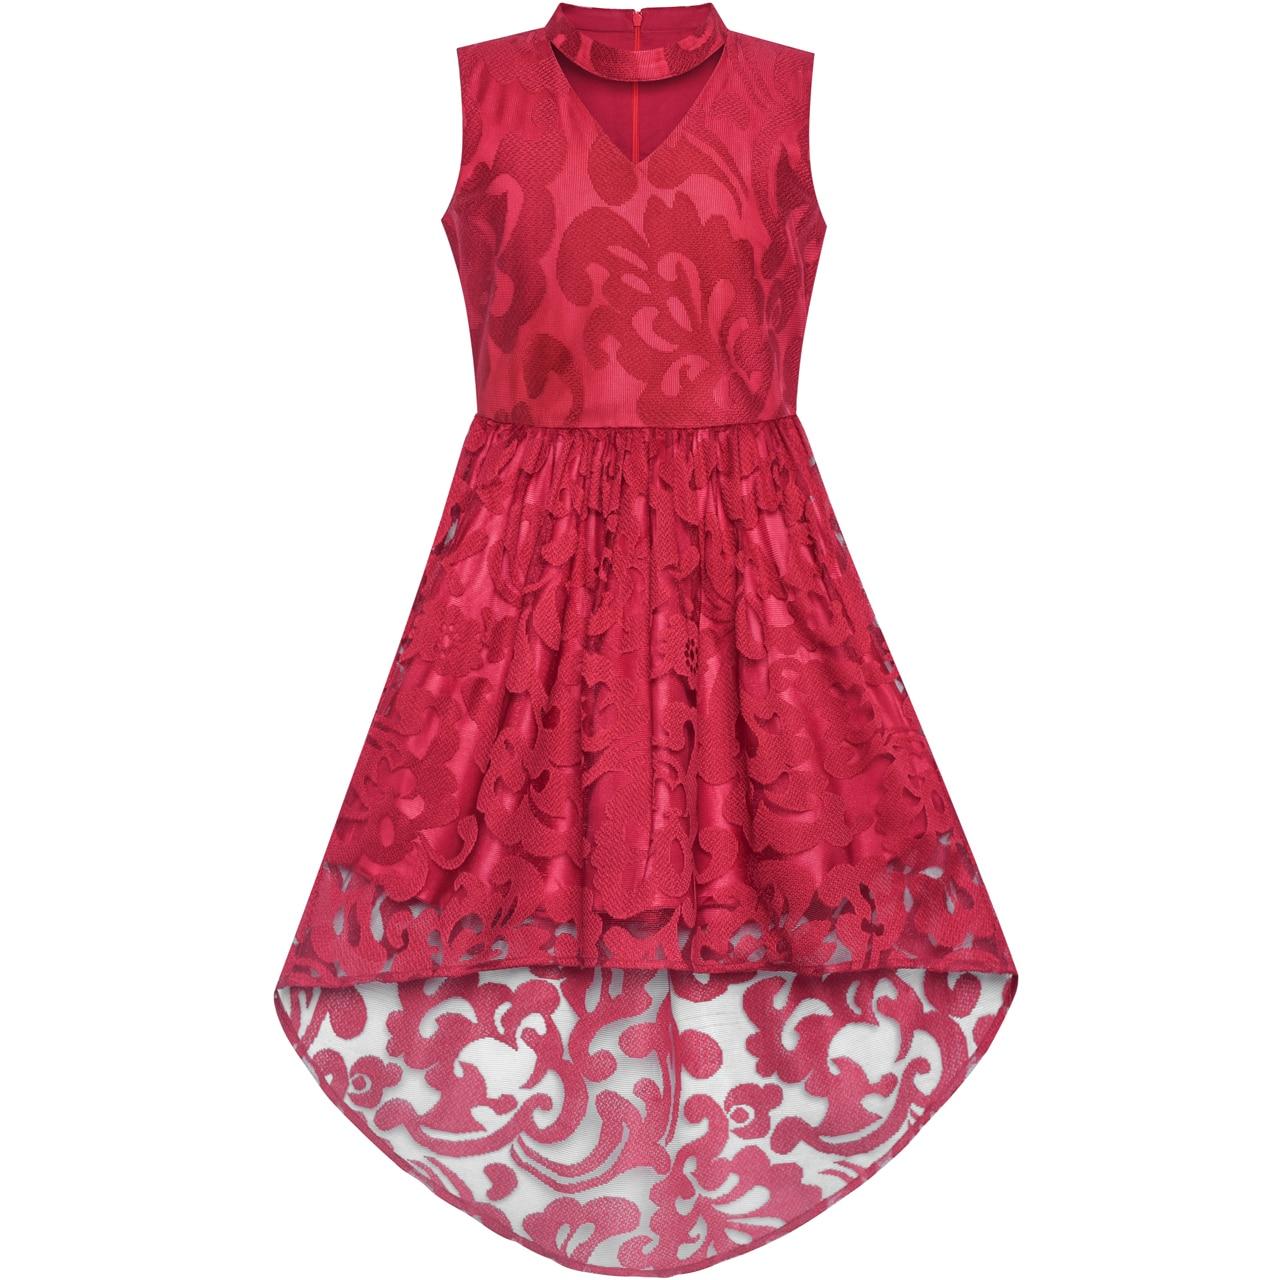 Flower Girl Dress Burgundy Lace Halter Hi-low Dress Dancing Party 2018 Summer Princess Wedding Dresses Girl Clothes Size 6-12